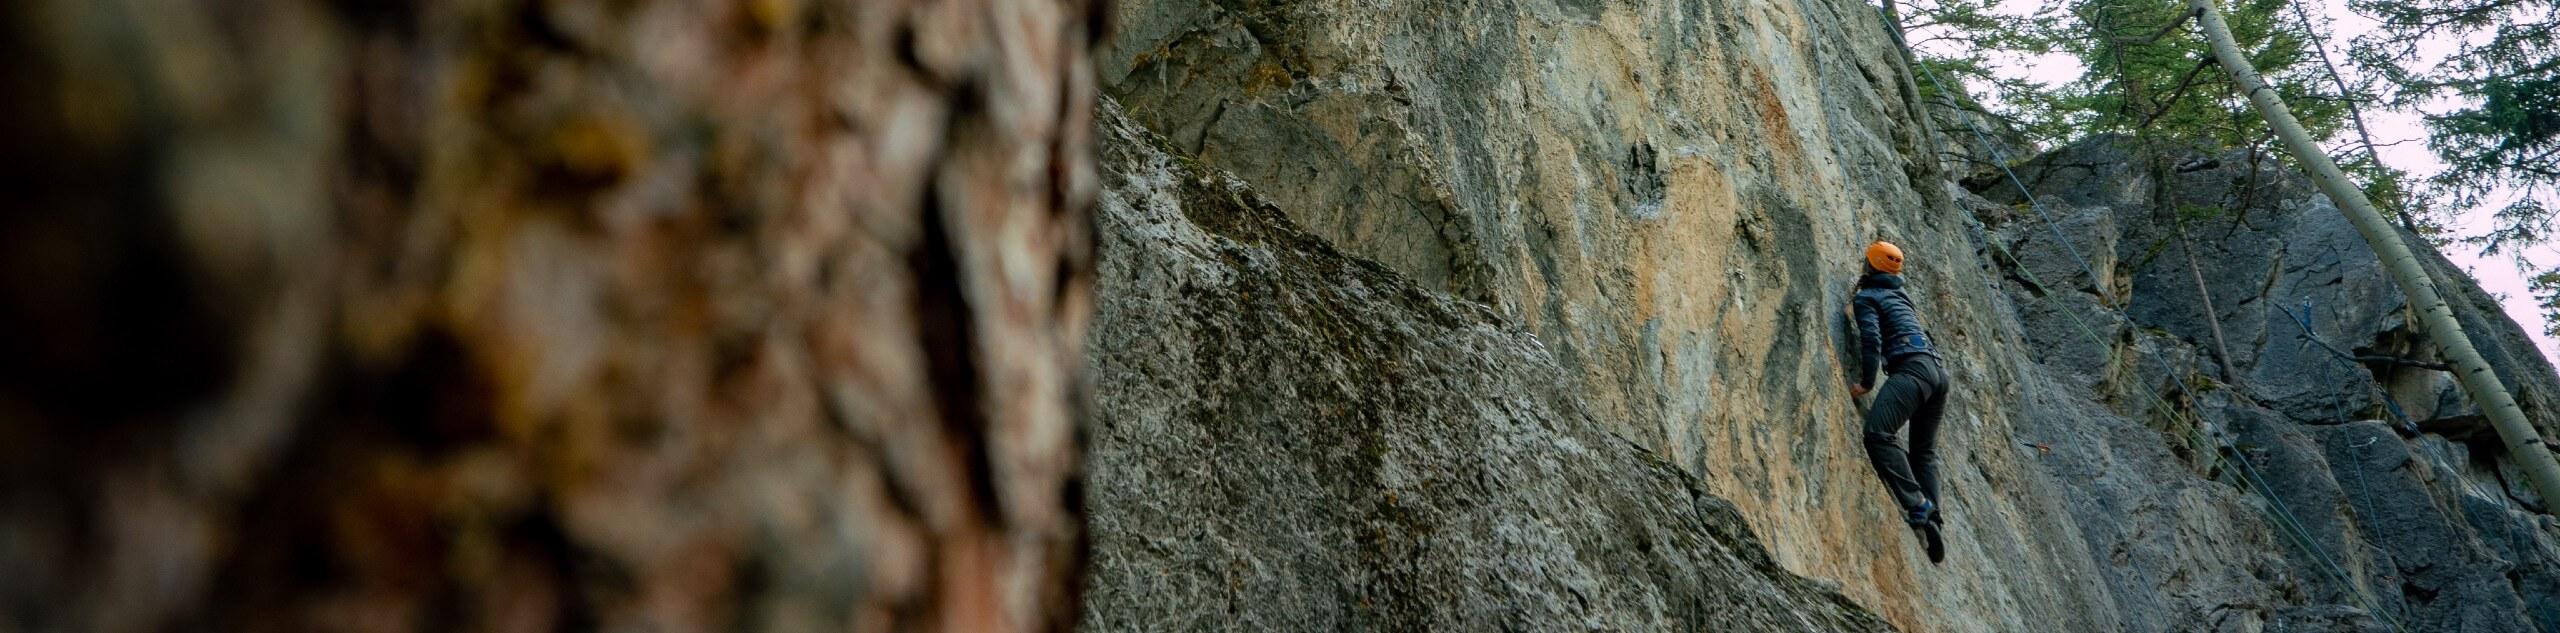 Outdoor Rock Climbing Level 1 in Canadian Rockies